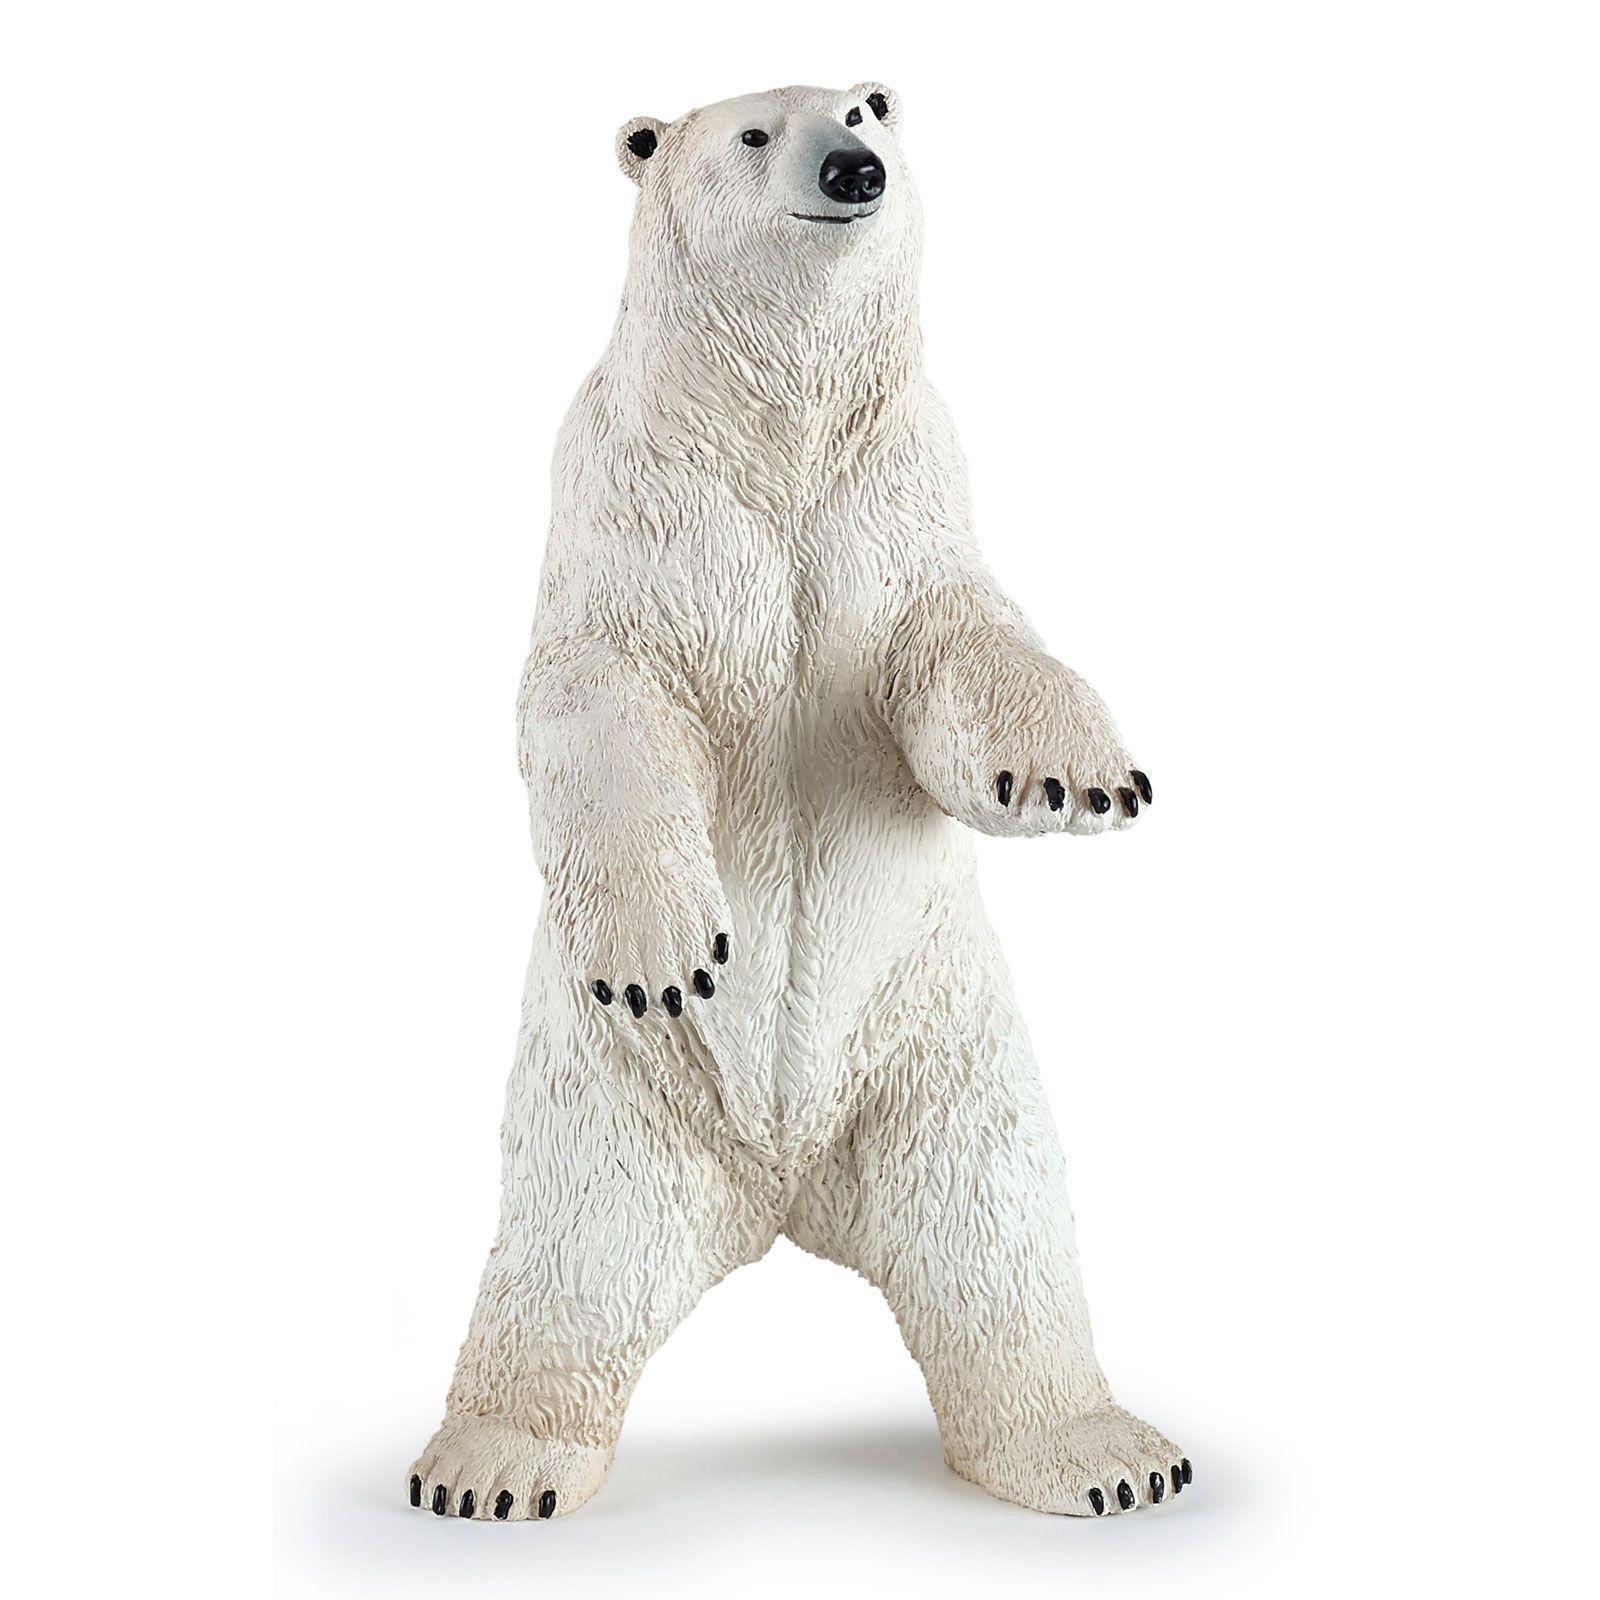 Papo φιγουρα Ορθια Πολικη Αρκουδα